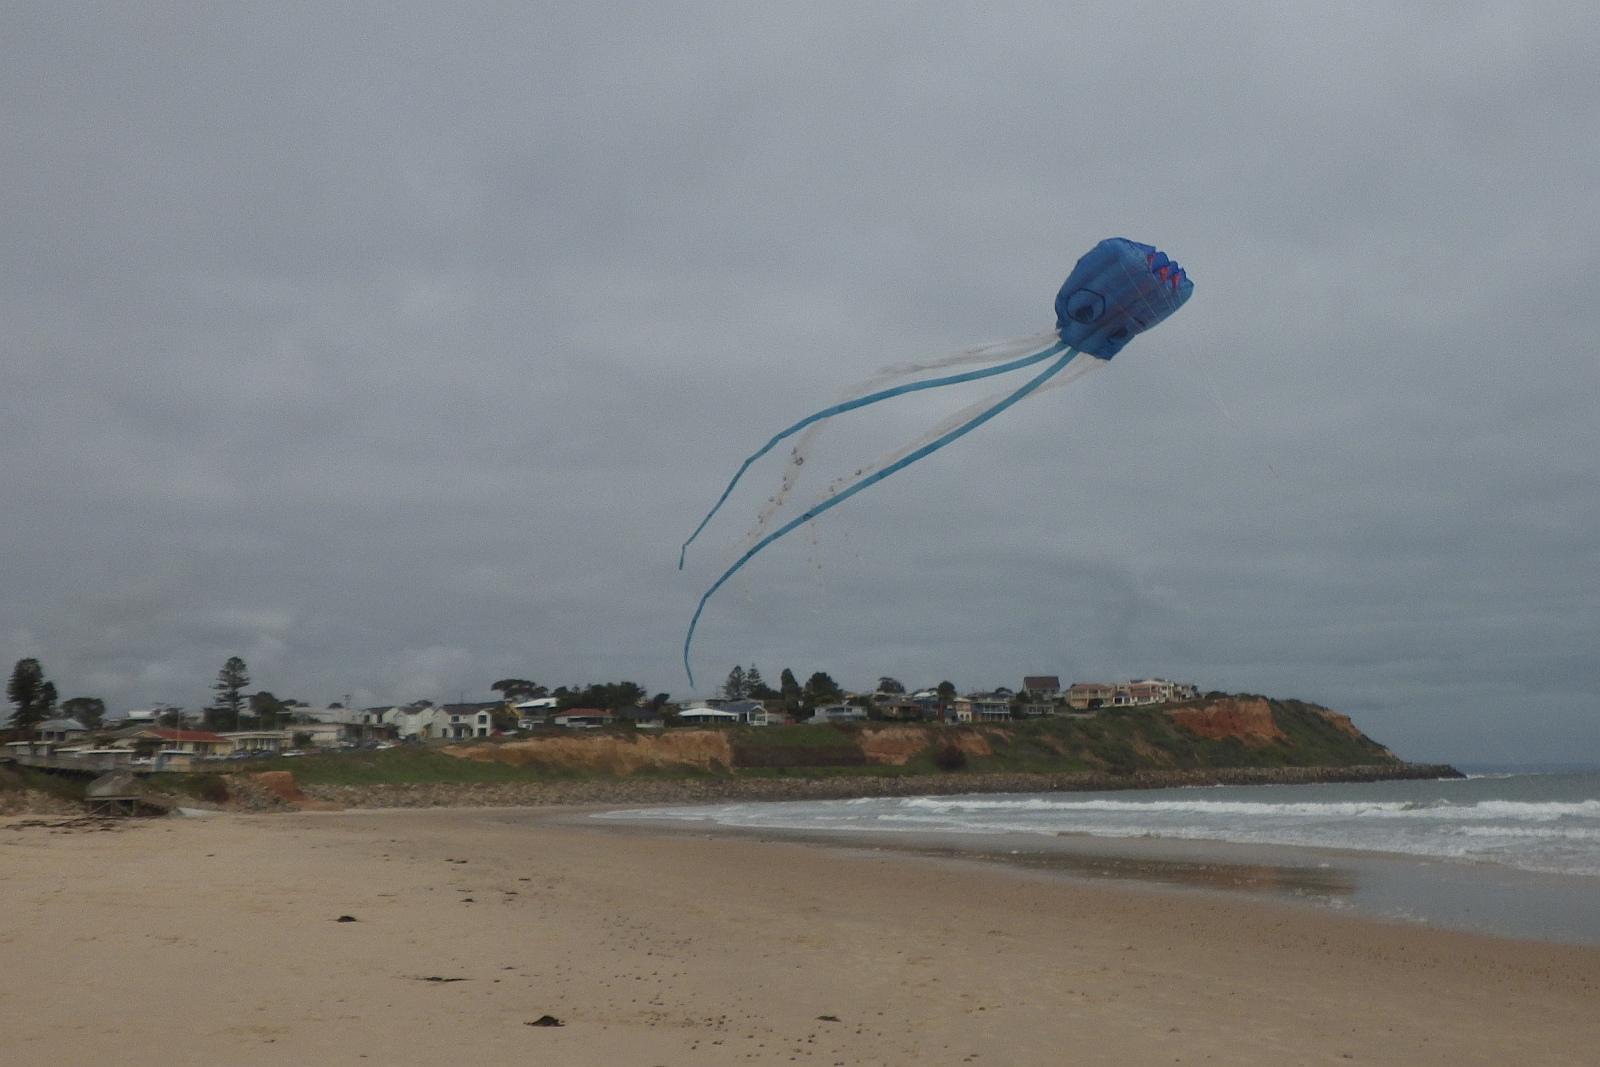 MBK Octopus kite 1 - 4.